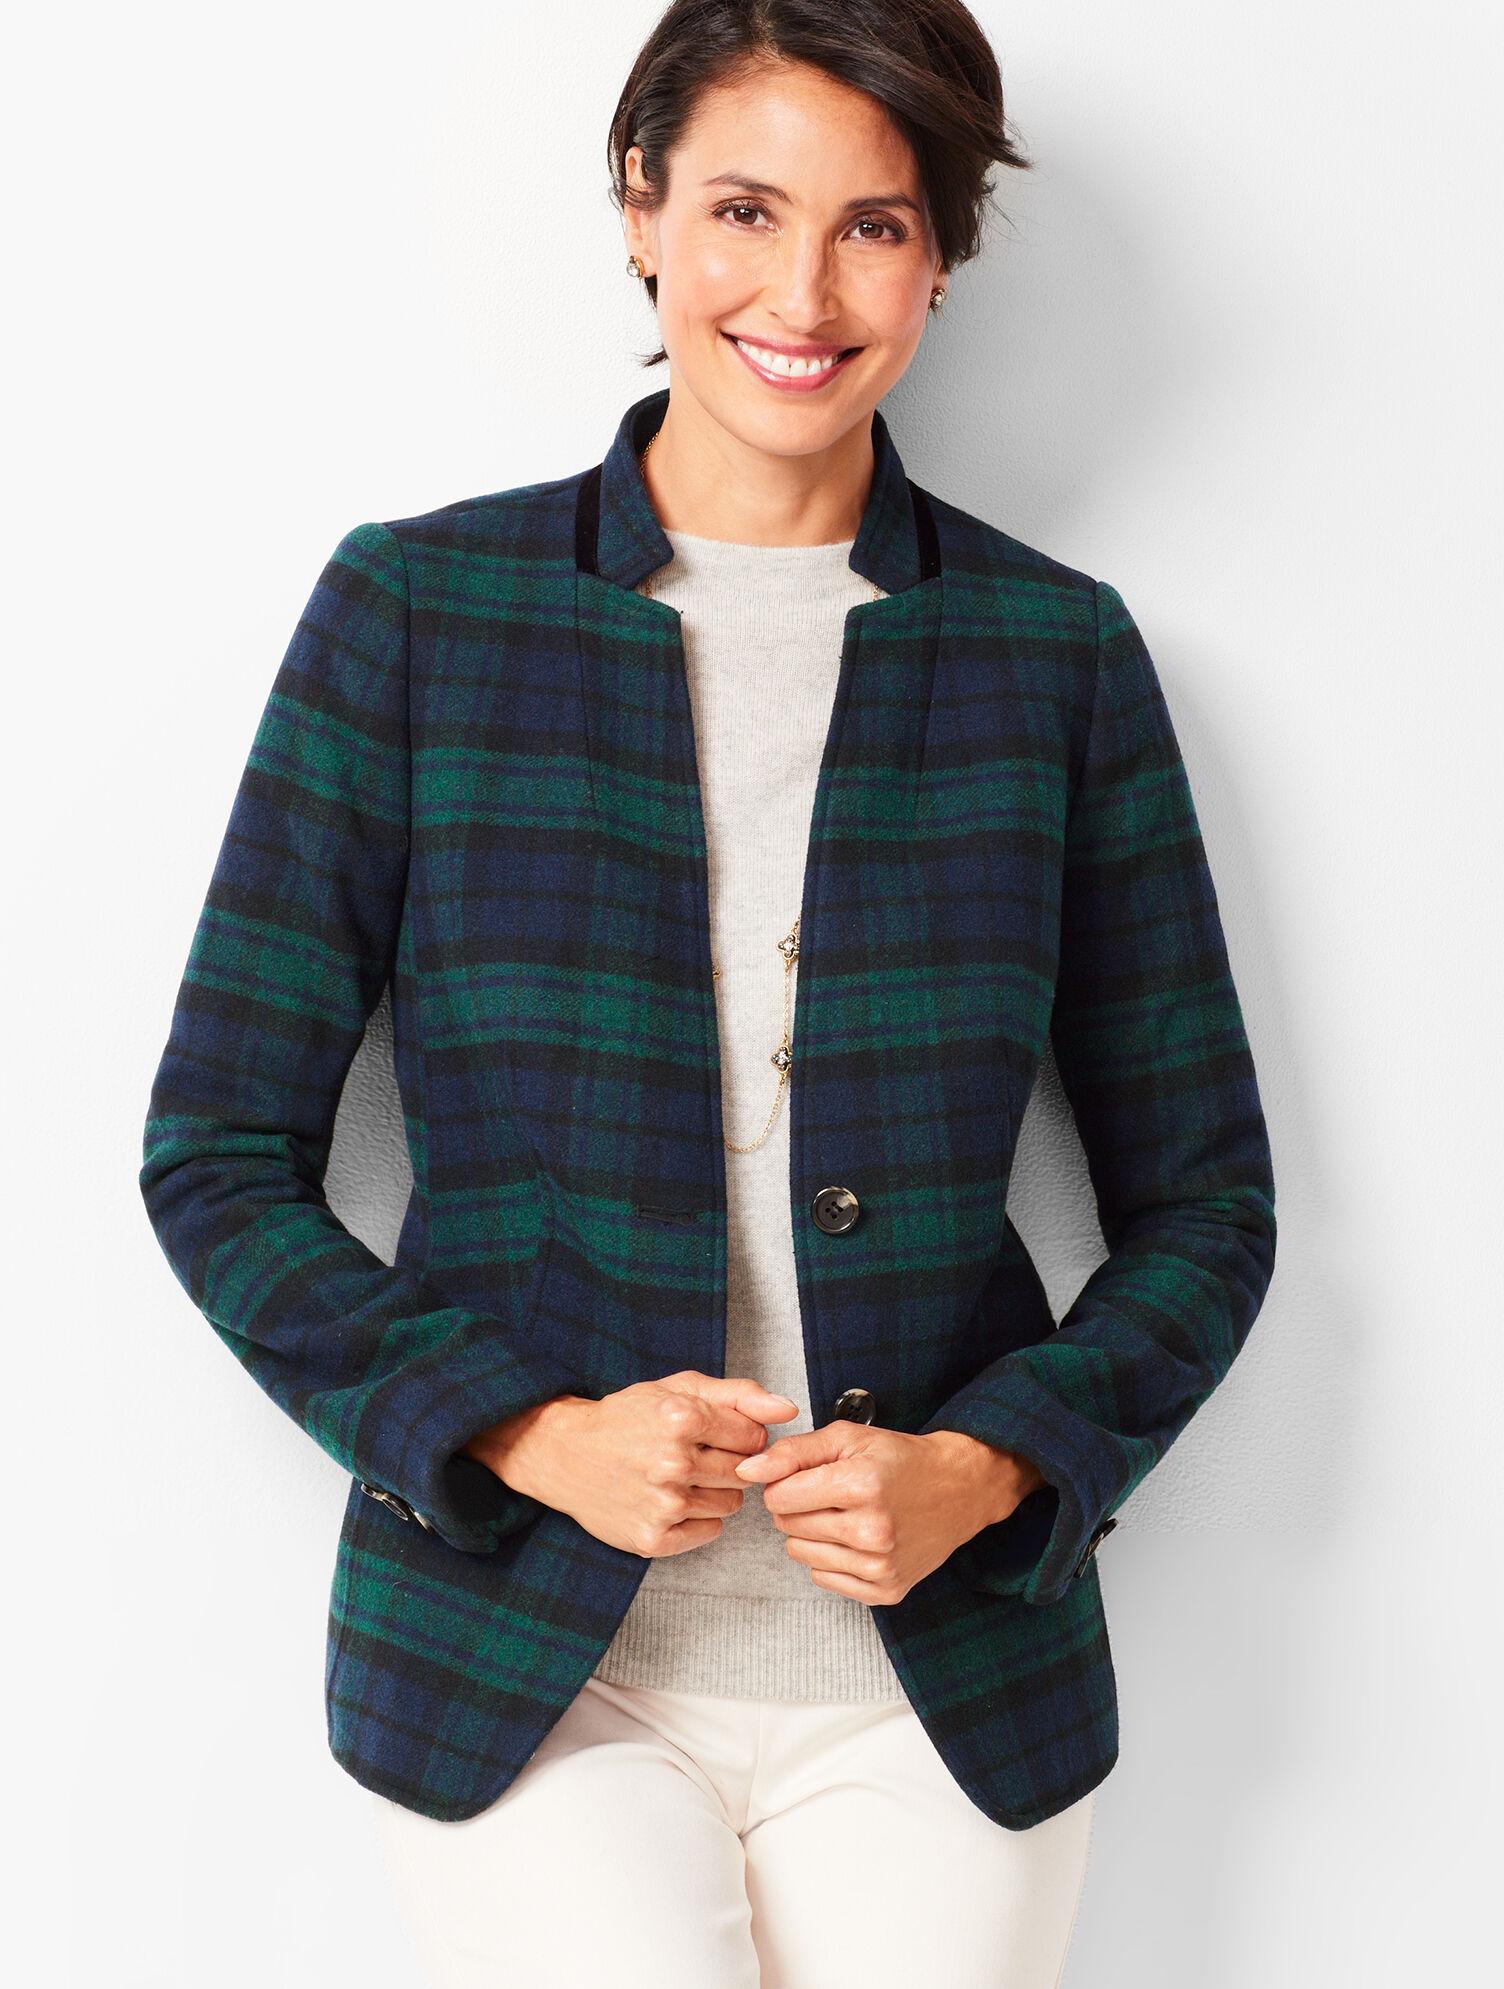 Women's Clothing Talbots Womens Blazer Jacket Black With White Trim 100% Wool Size Large